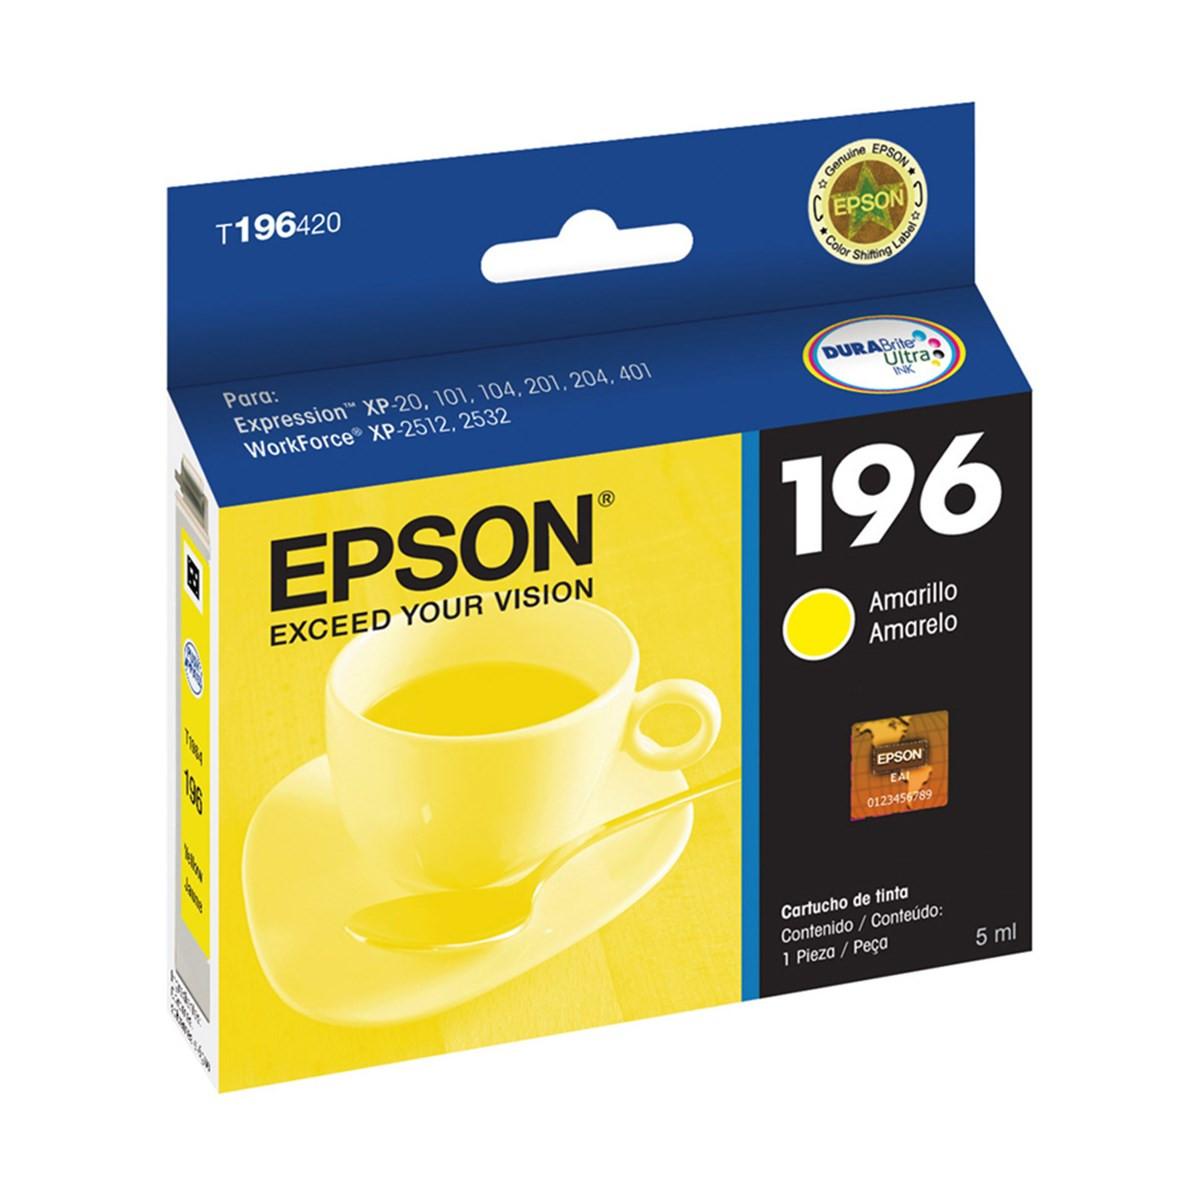 Cartucho de Tinta Epson T196420 T196 Amarelo | XP101 XP201 XP214 XP401 XP411 WF-2532 | Original 4ml